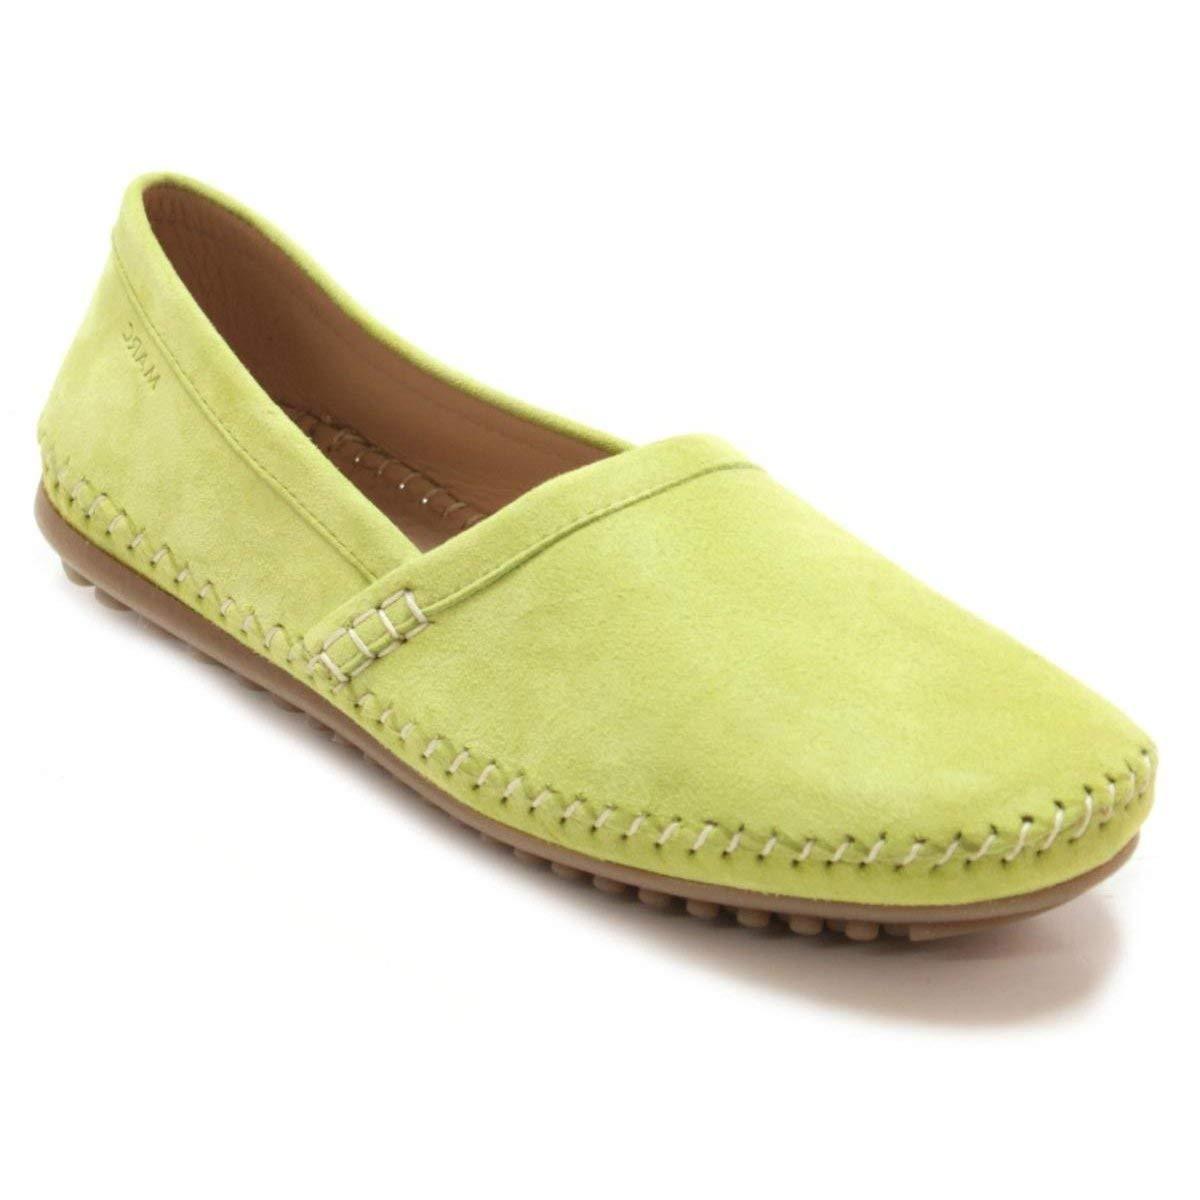 Marc scarpe Luna, Espadrillas Basse Donna